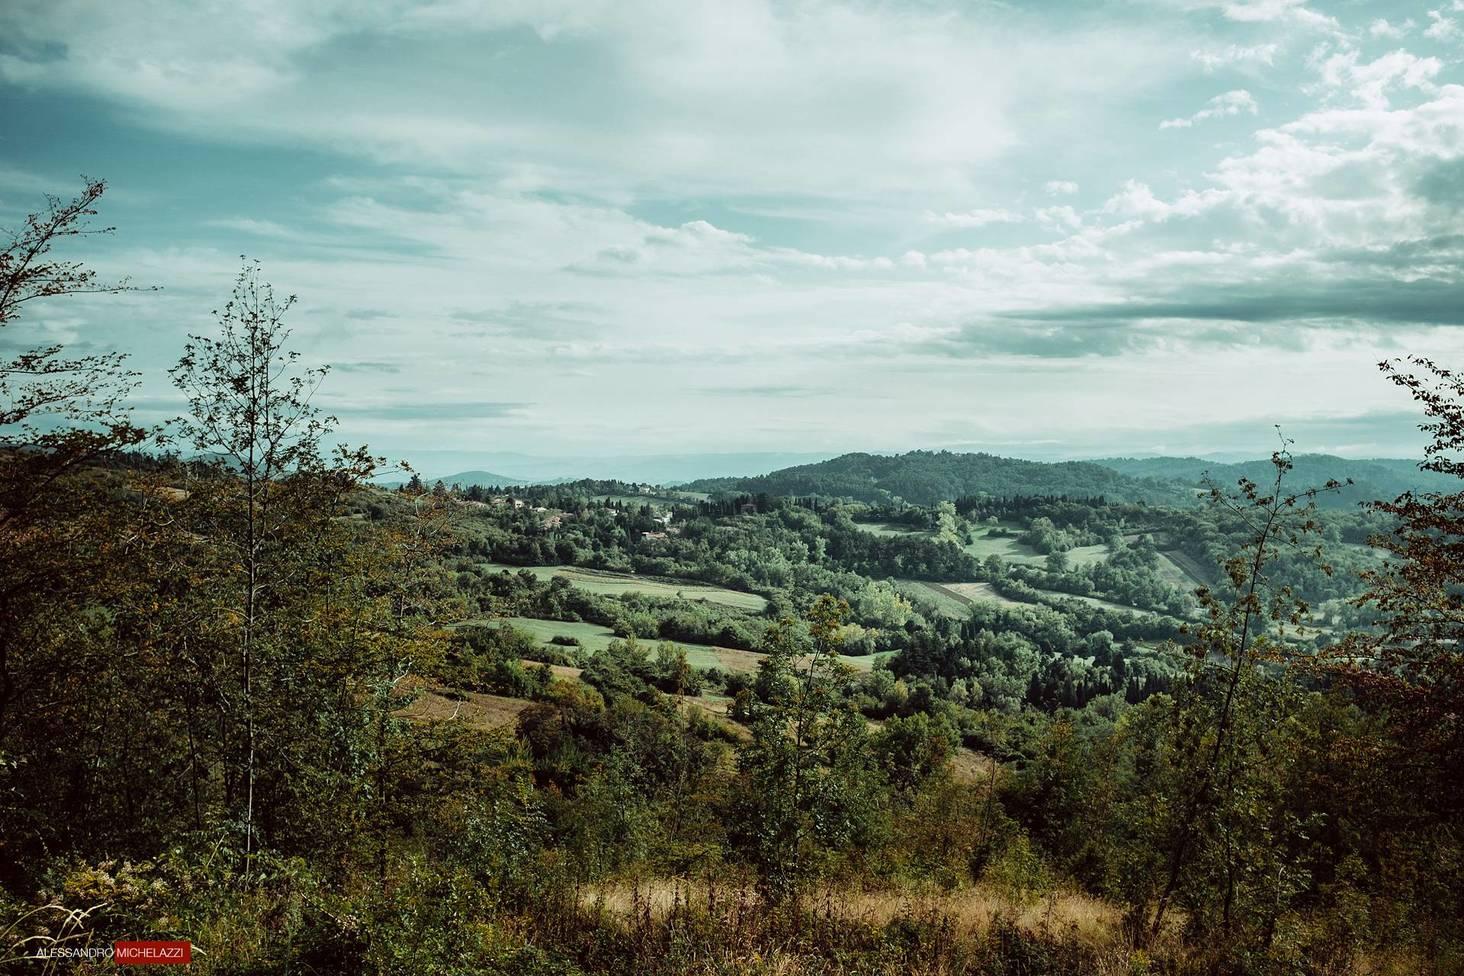 Tuscany's landscape